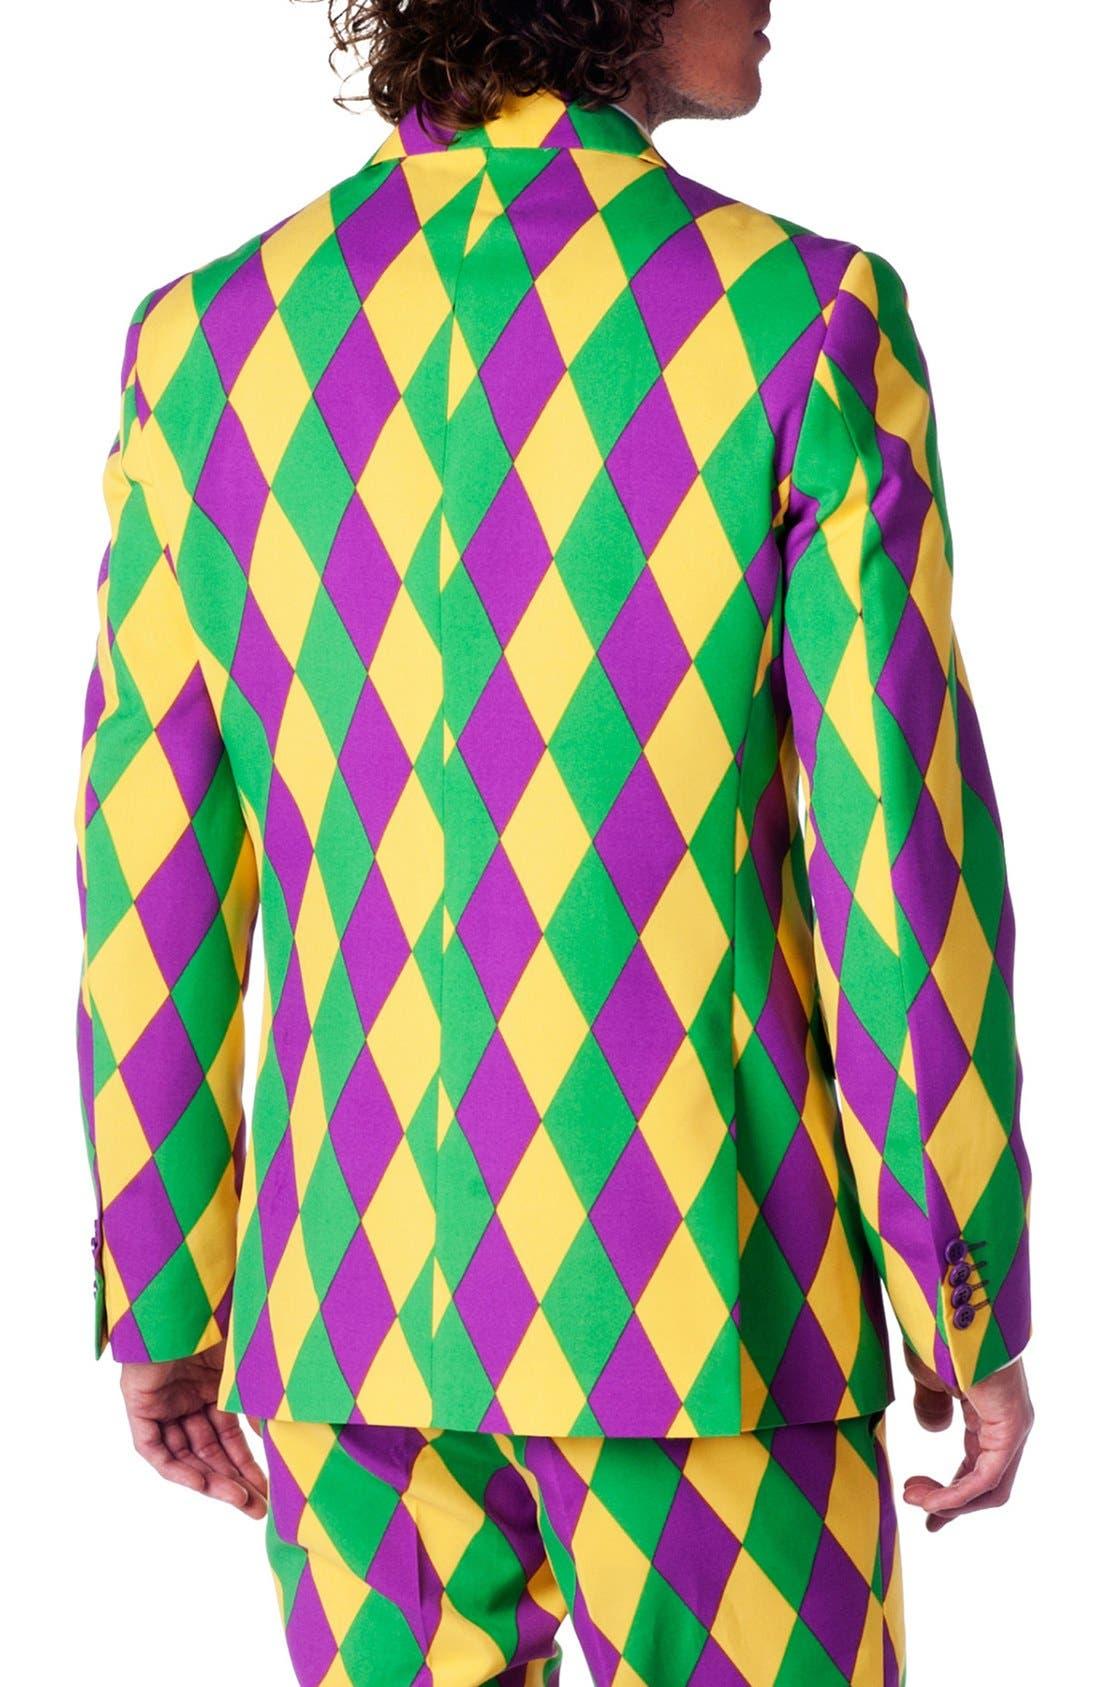 'Harleking' Trim Fit Suit with Tie,                             Alternate thumbnail 2, color,                             300